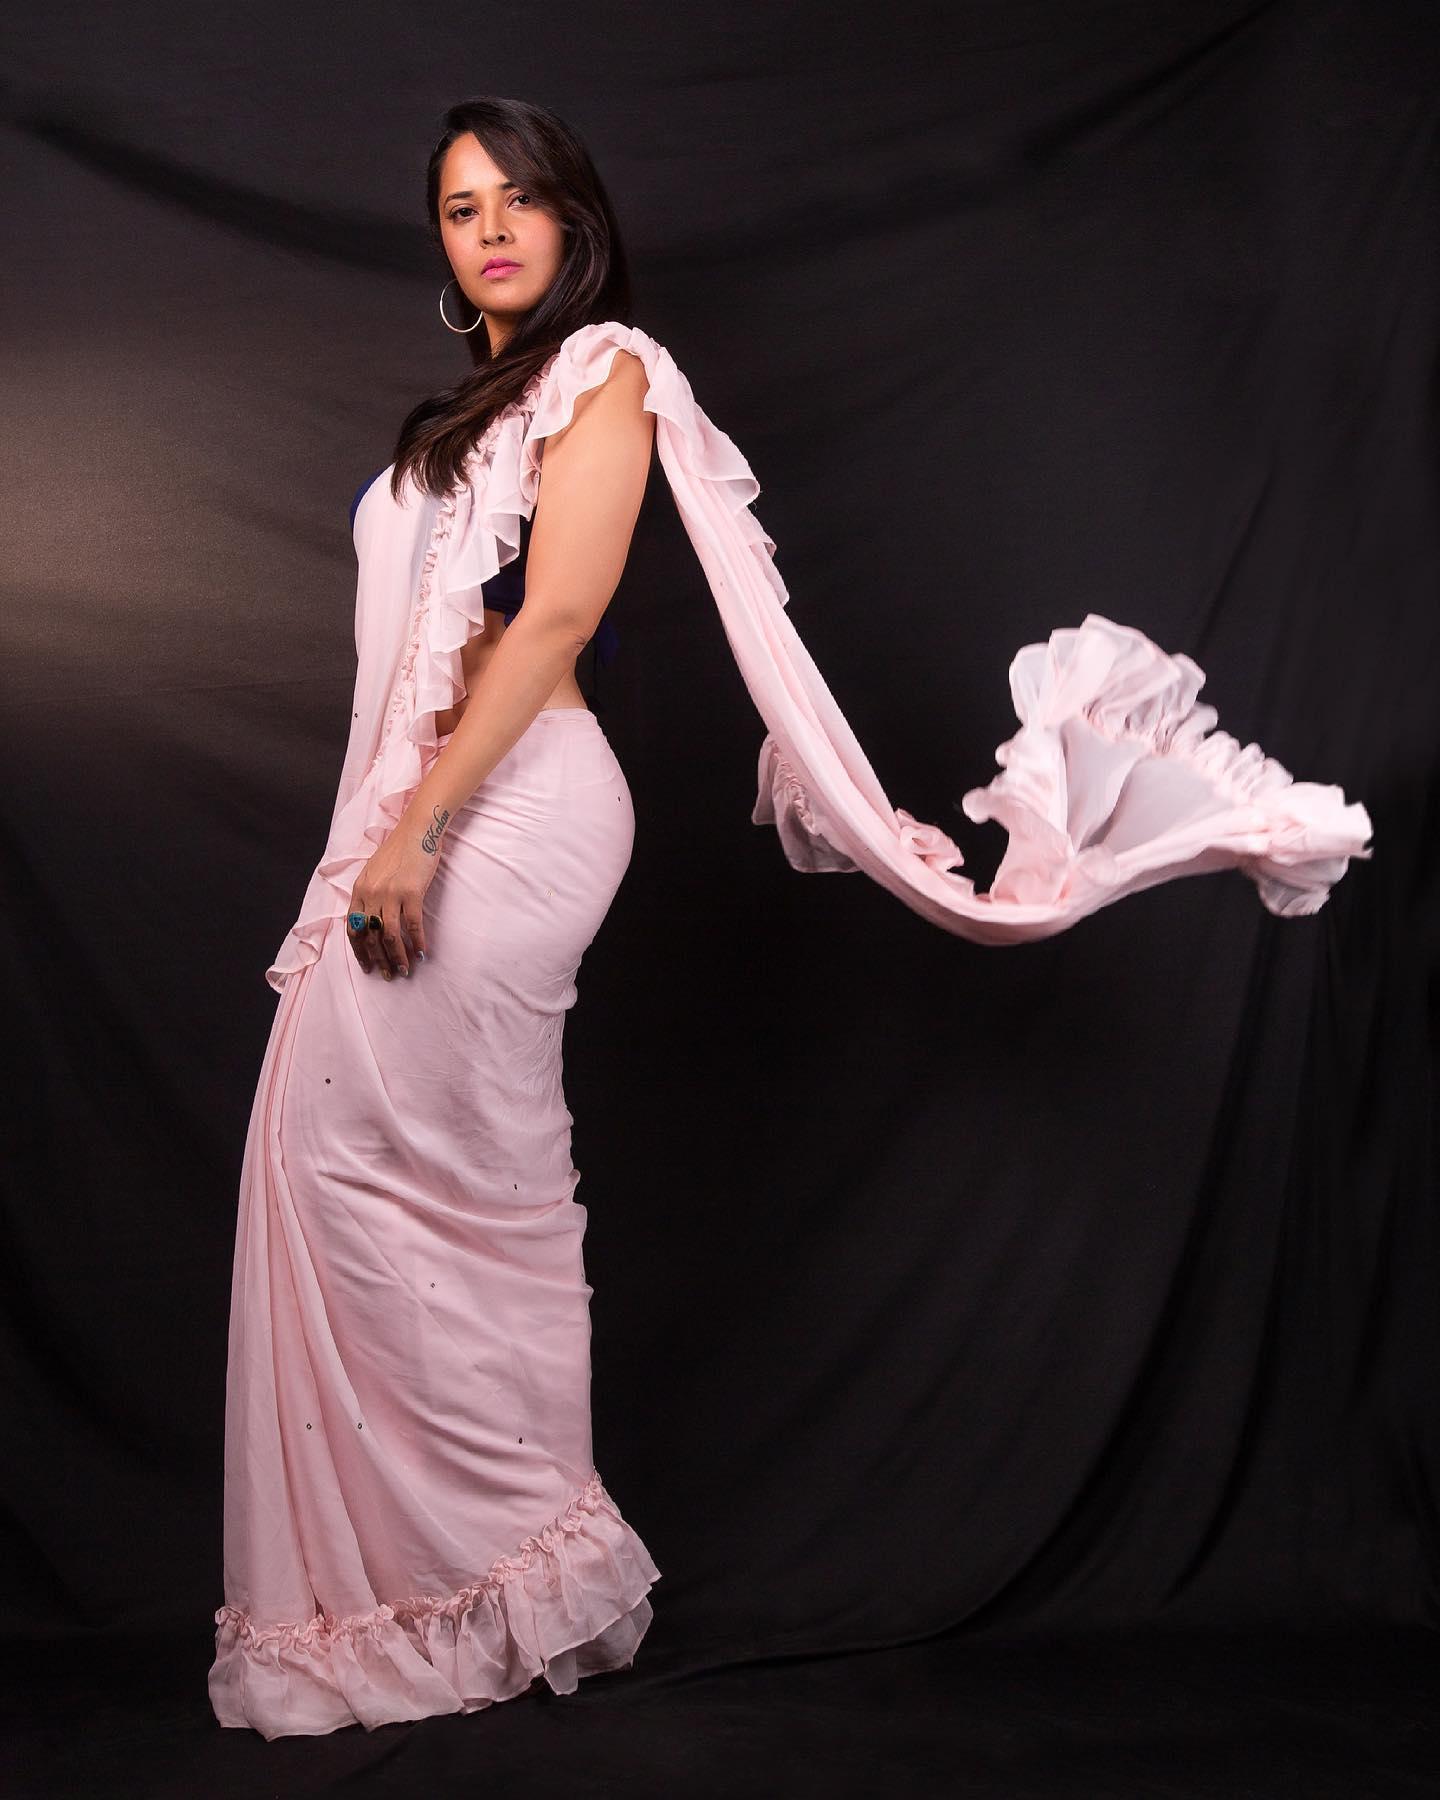 Beautiful actress Anasuya Bardwaj in blush pink color ruffle saree.  2021-07-09